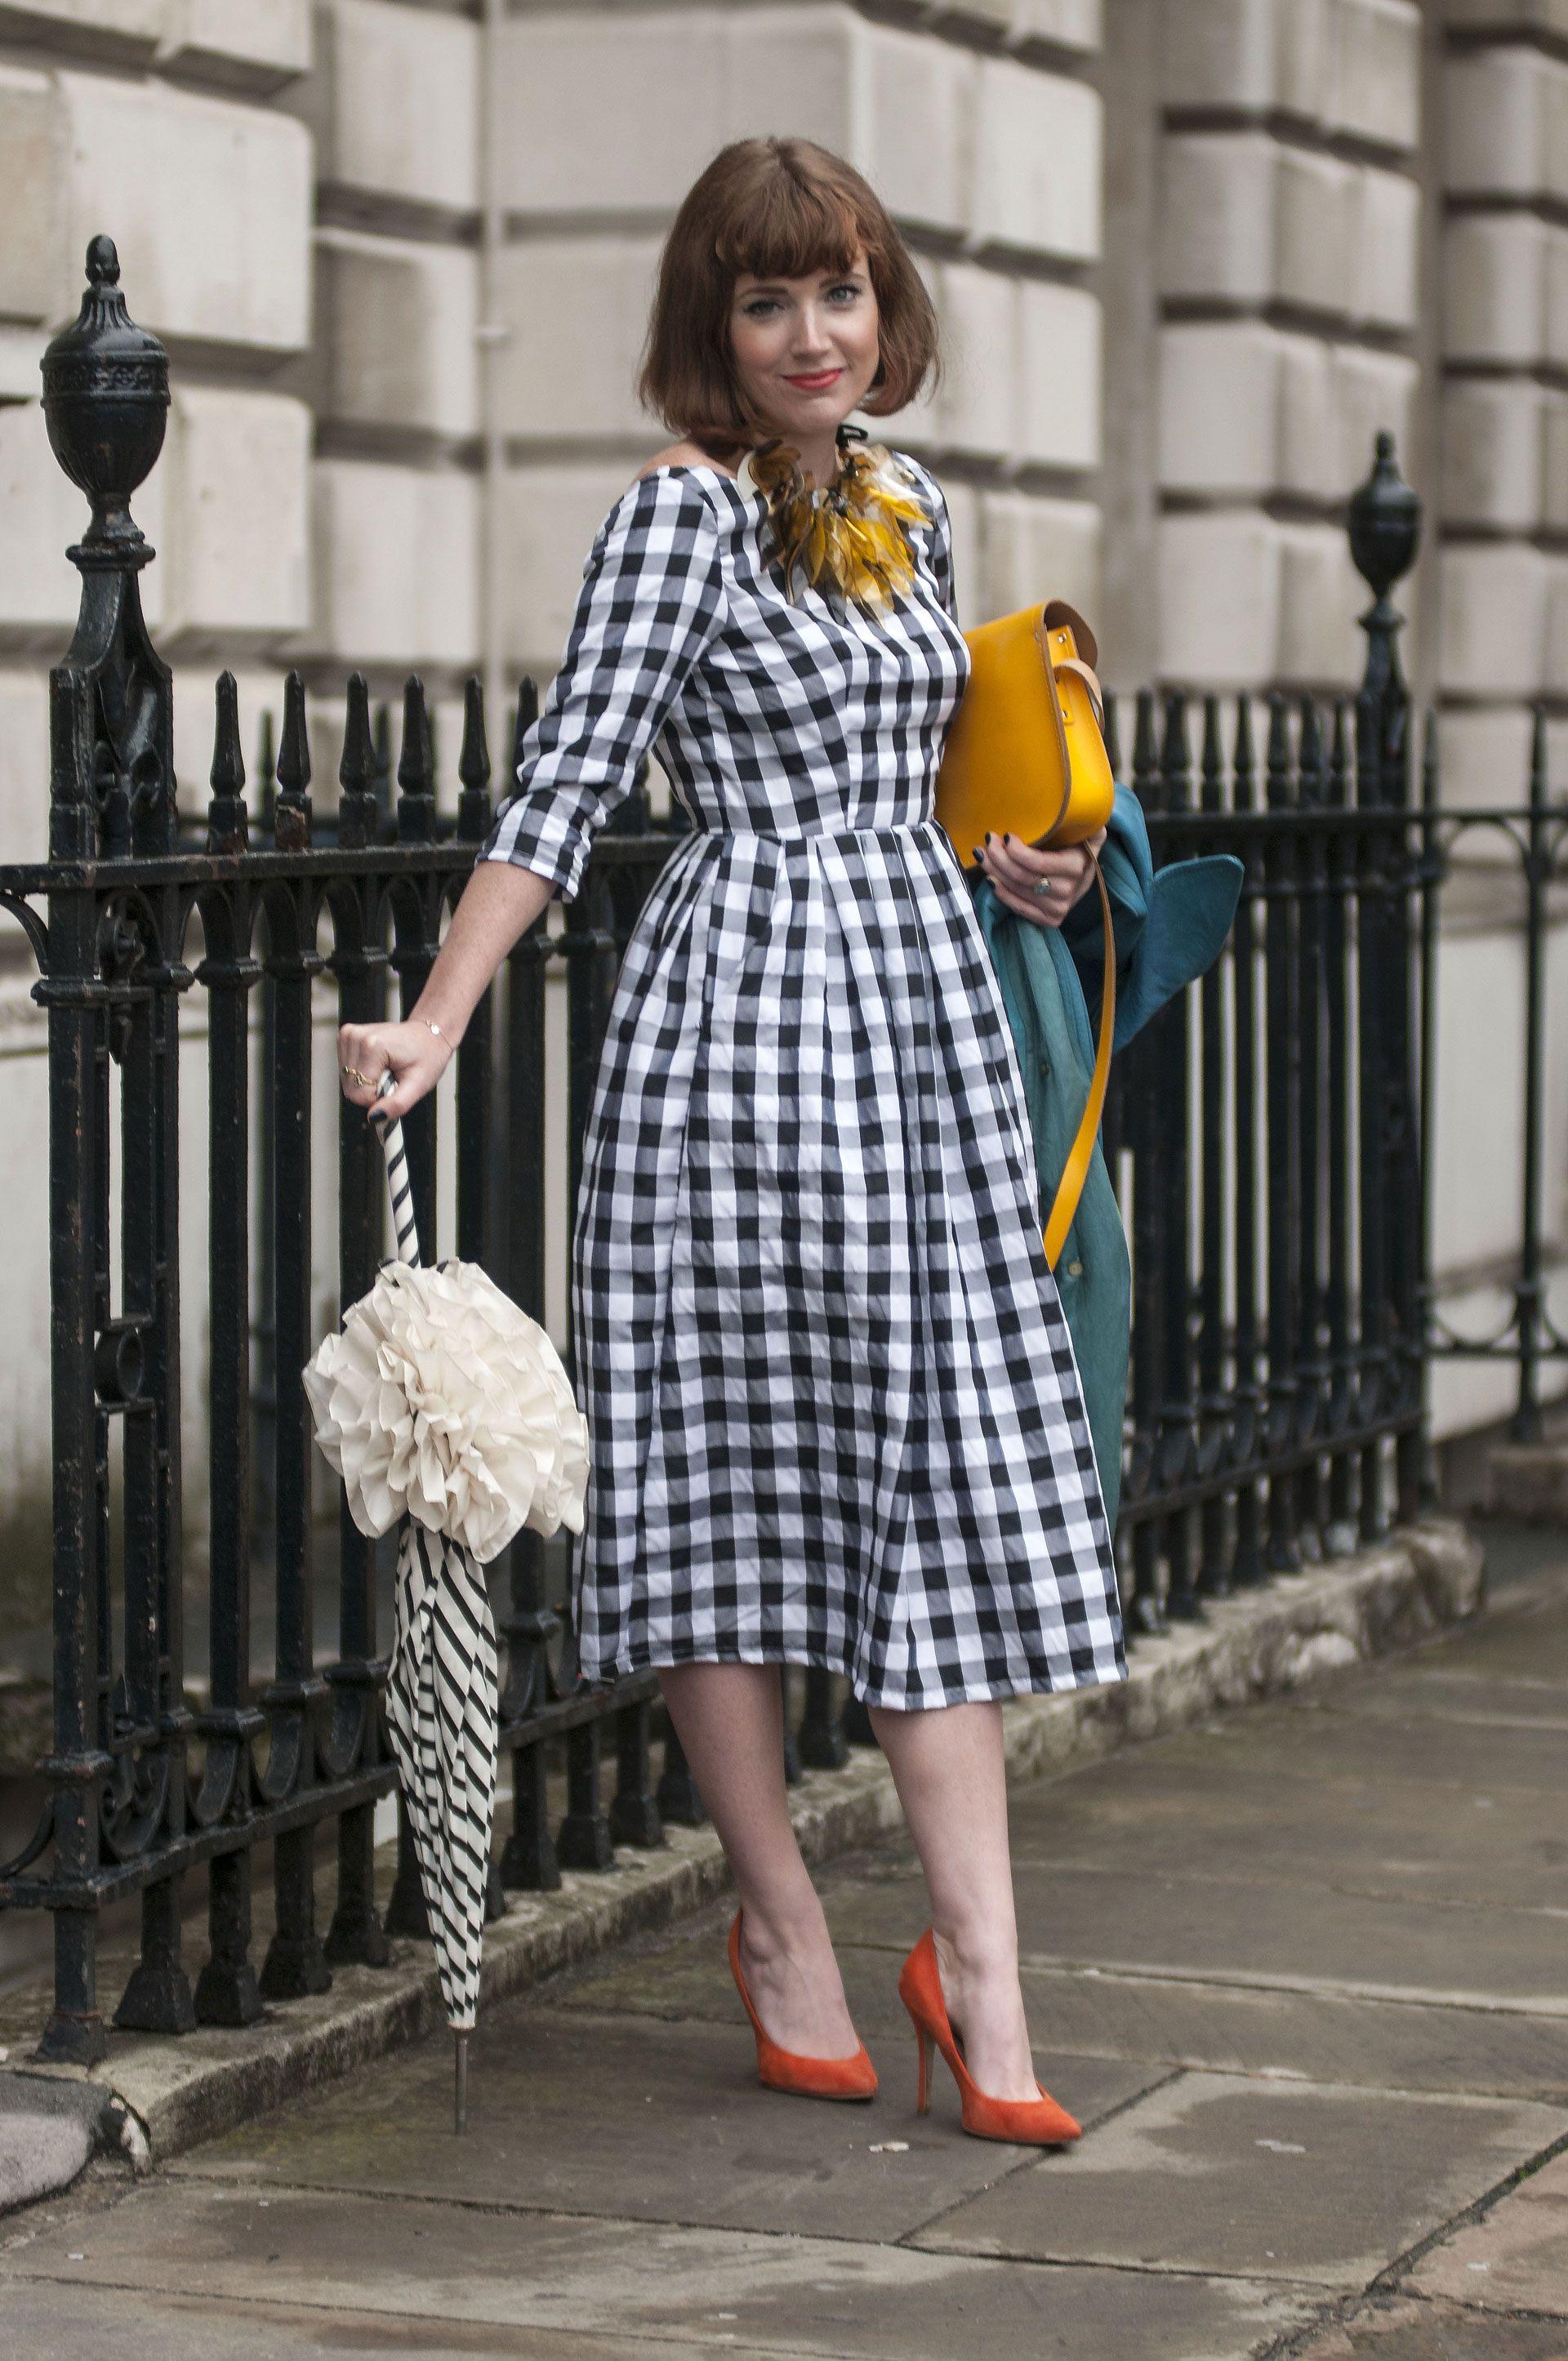 Topshop shoes, vintage coat, Cambridge Satchel bag, Marni for H